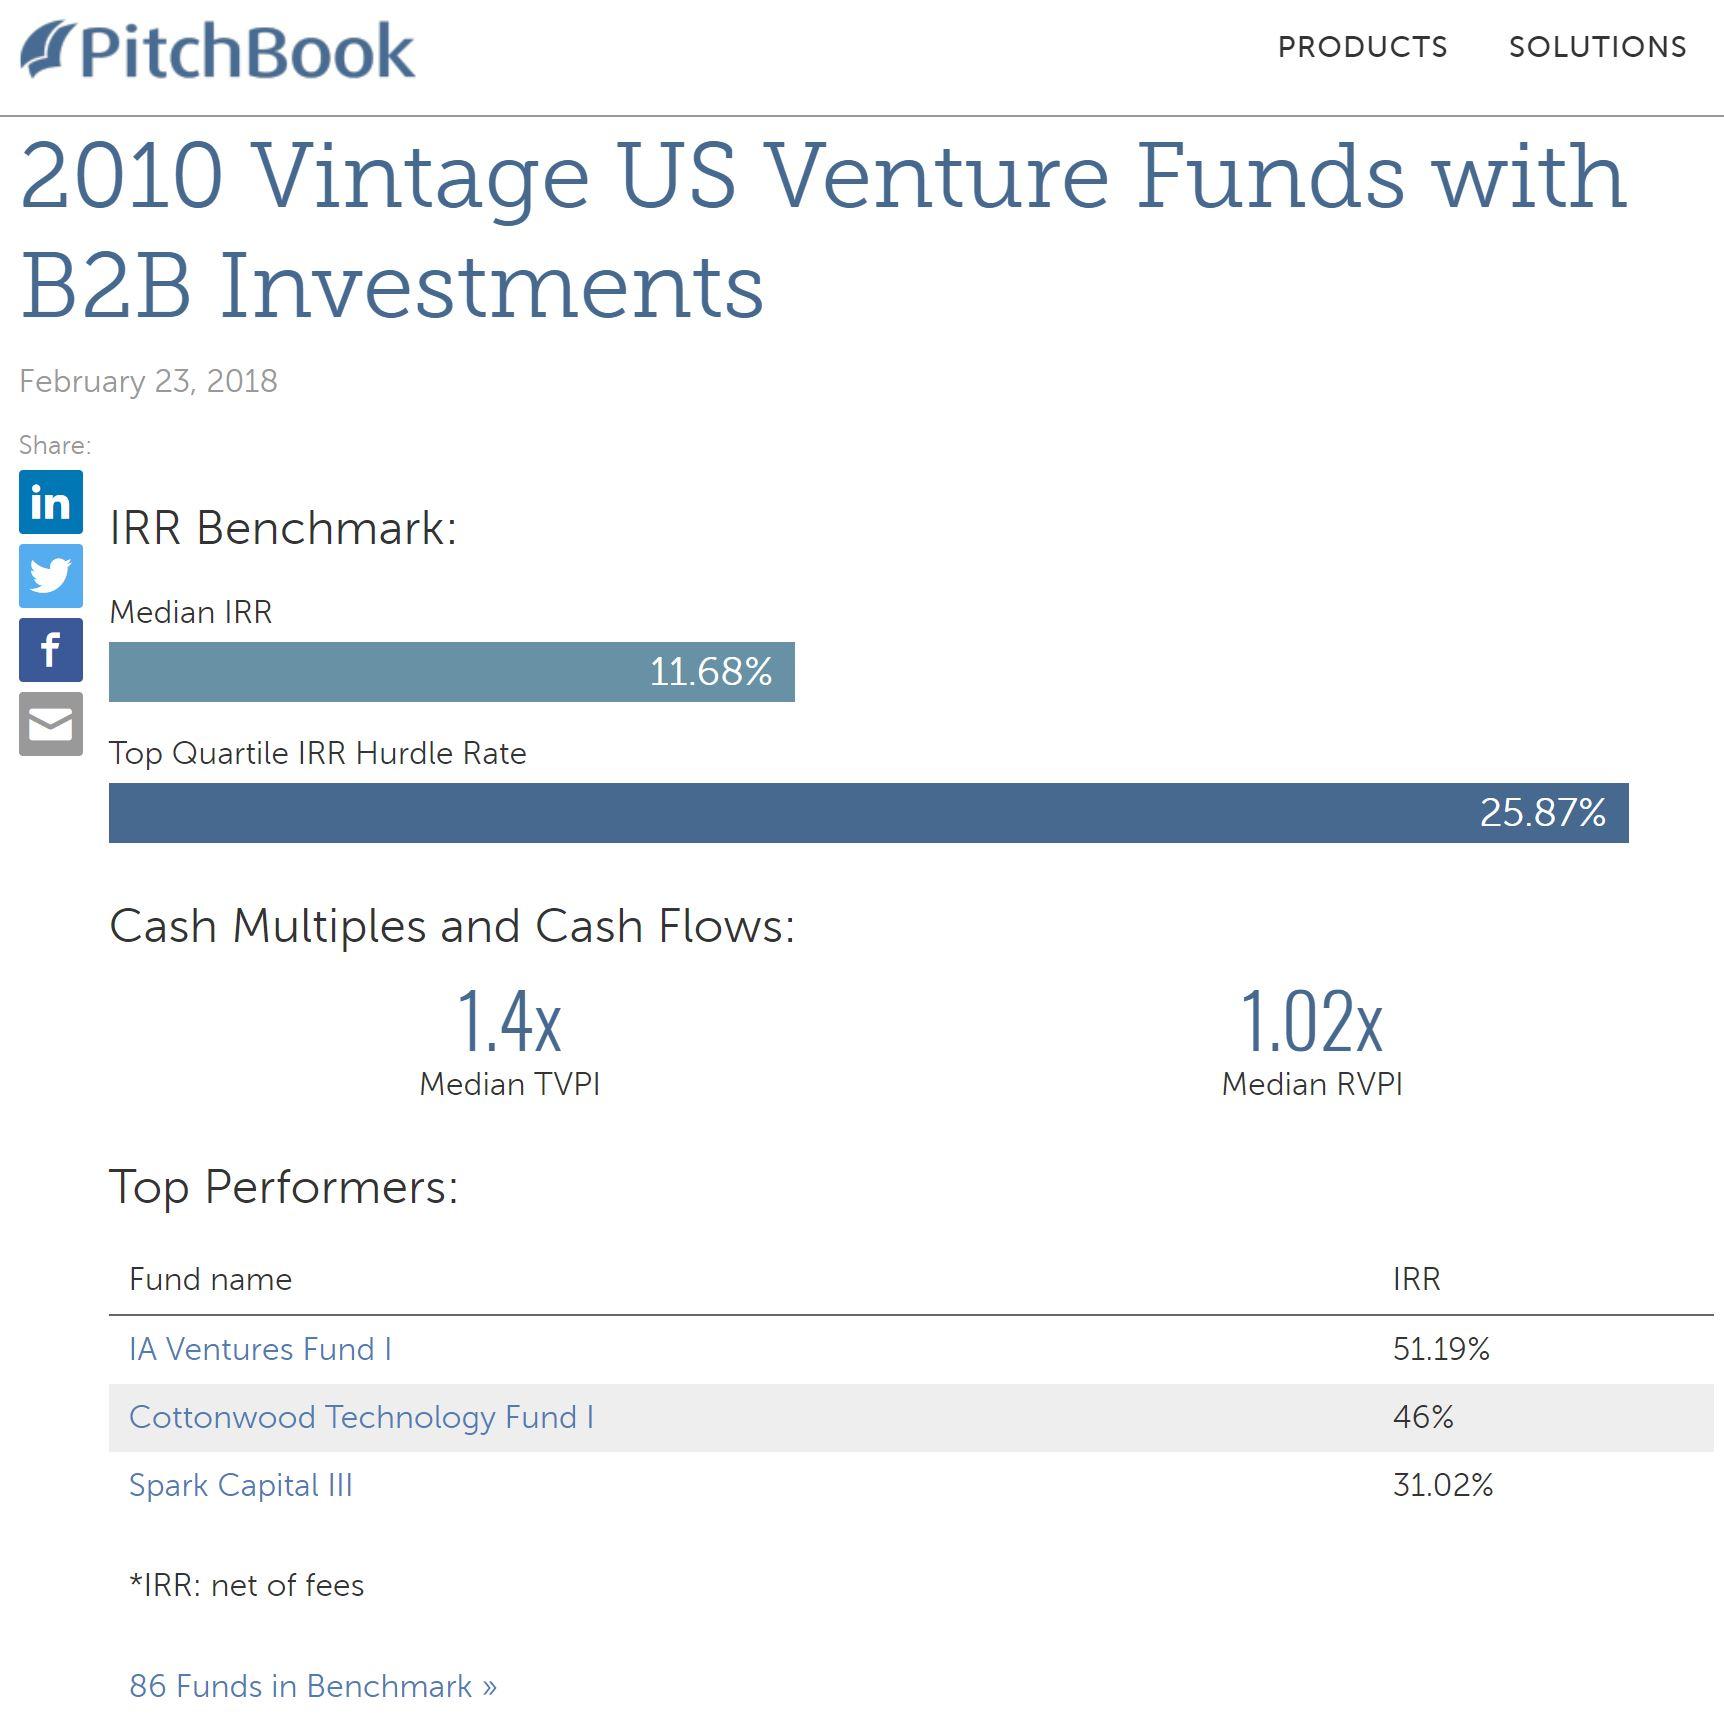 46% IRR Cottonwood Technology Fund